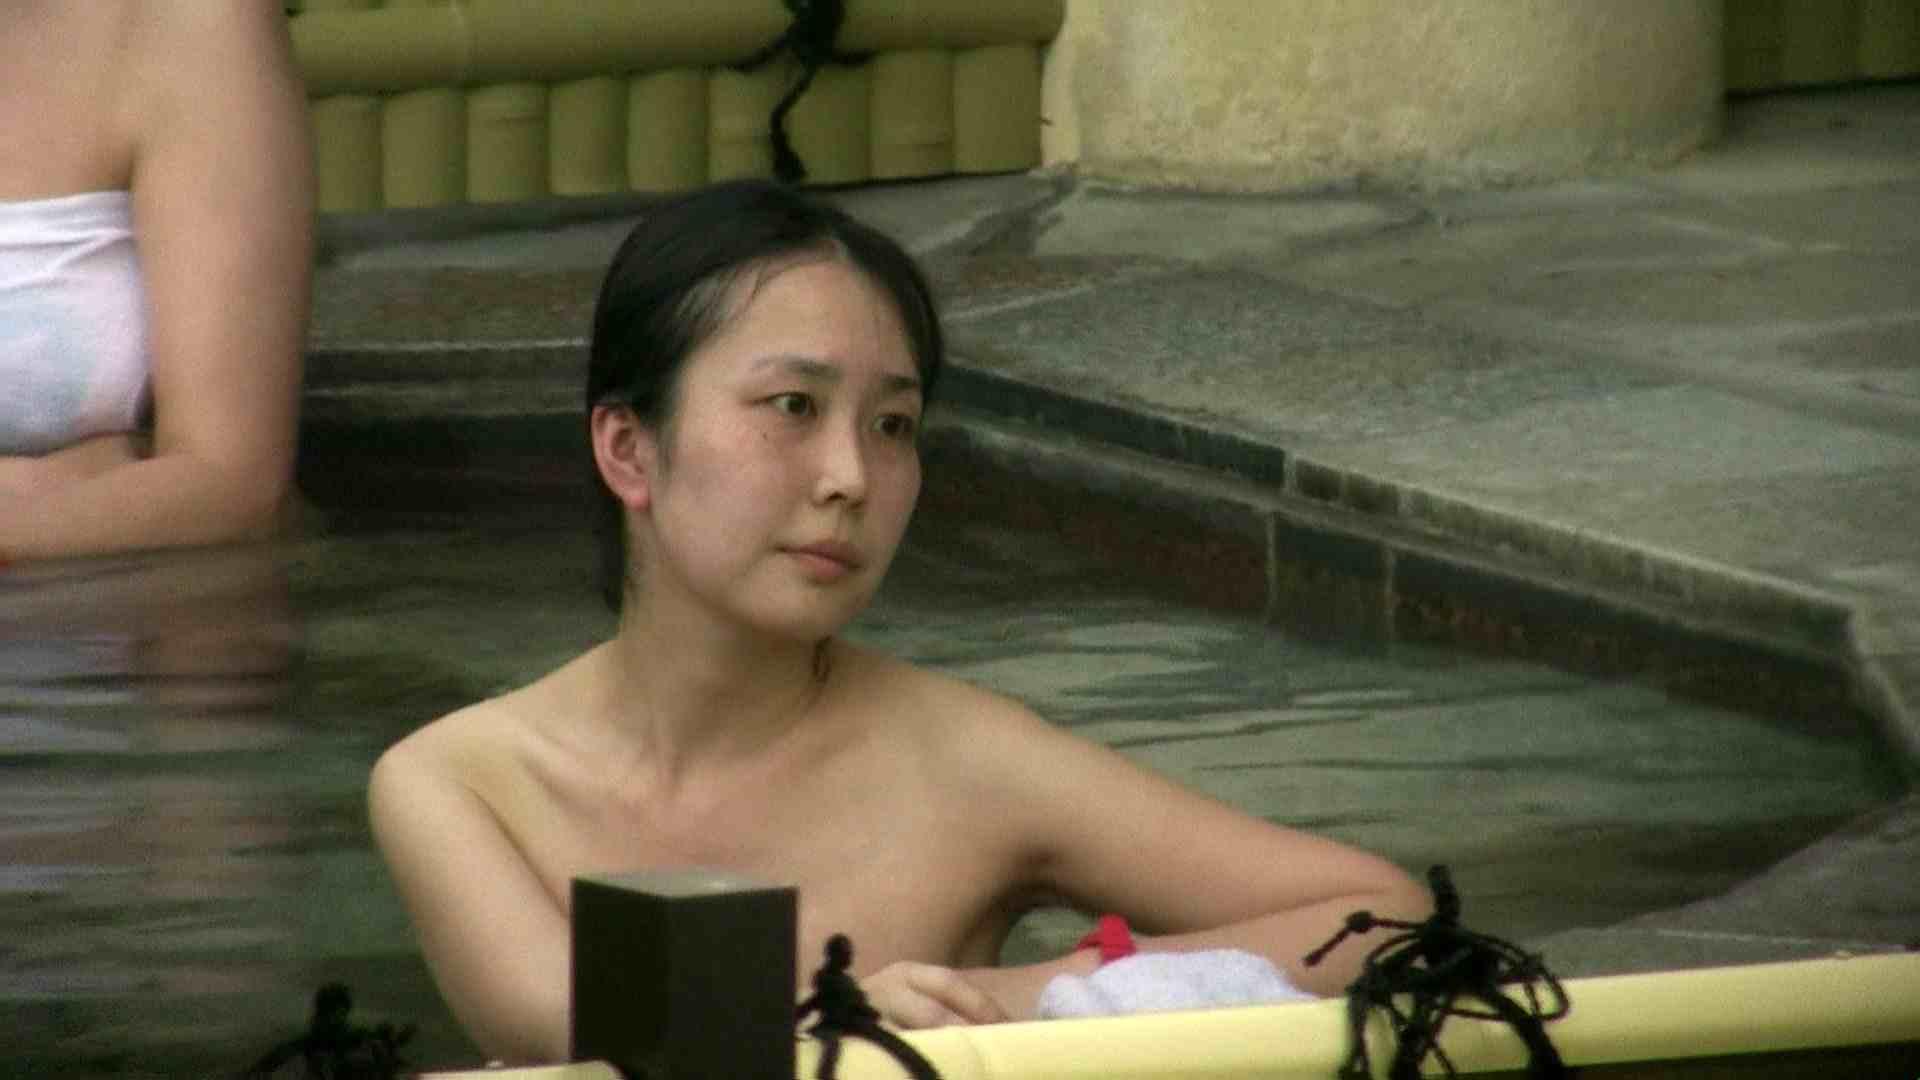 Aquaな露天風呂Vol.636 女体盗撮 盗み撮りSEX無修正画像 87連発 74